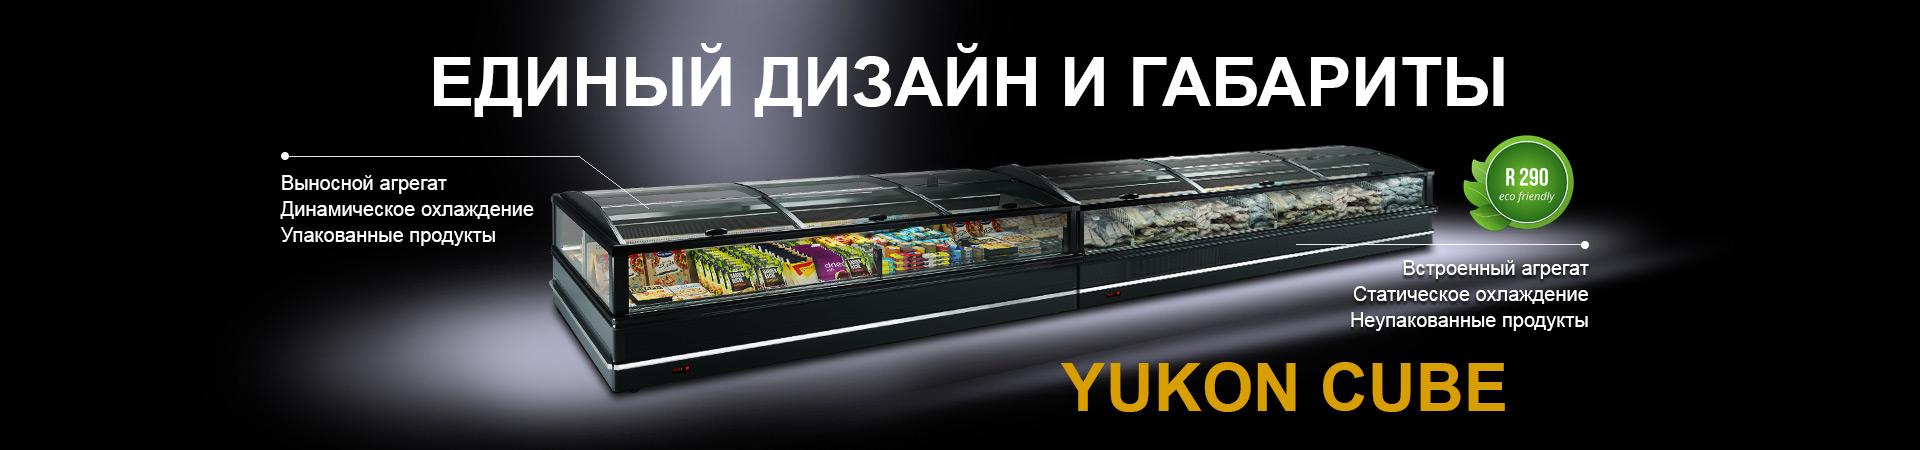 YUKON cube